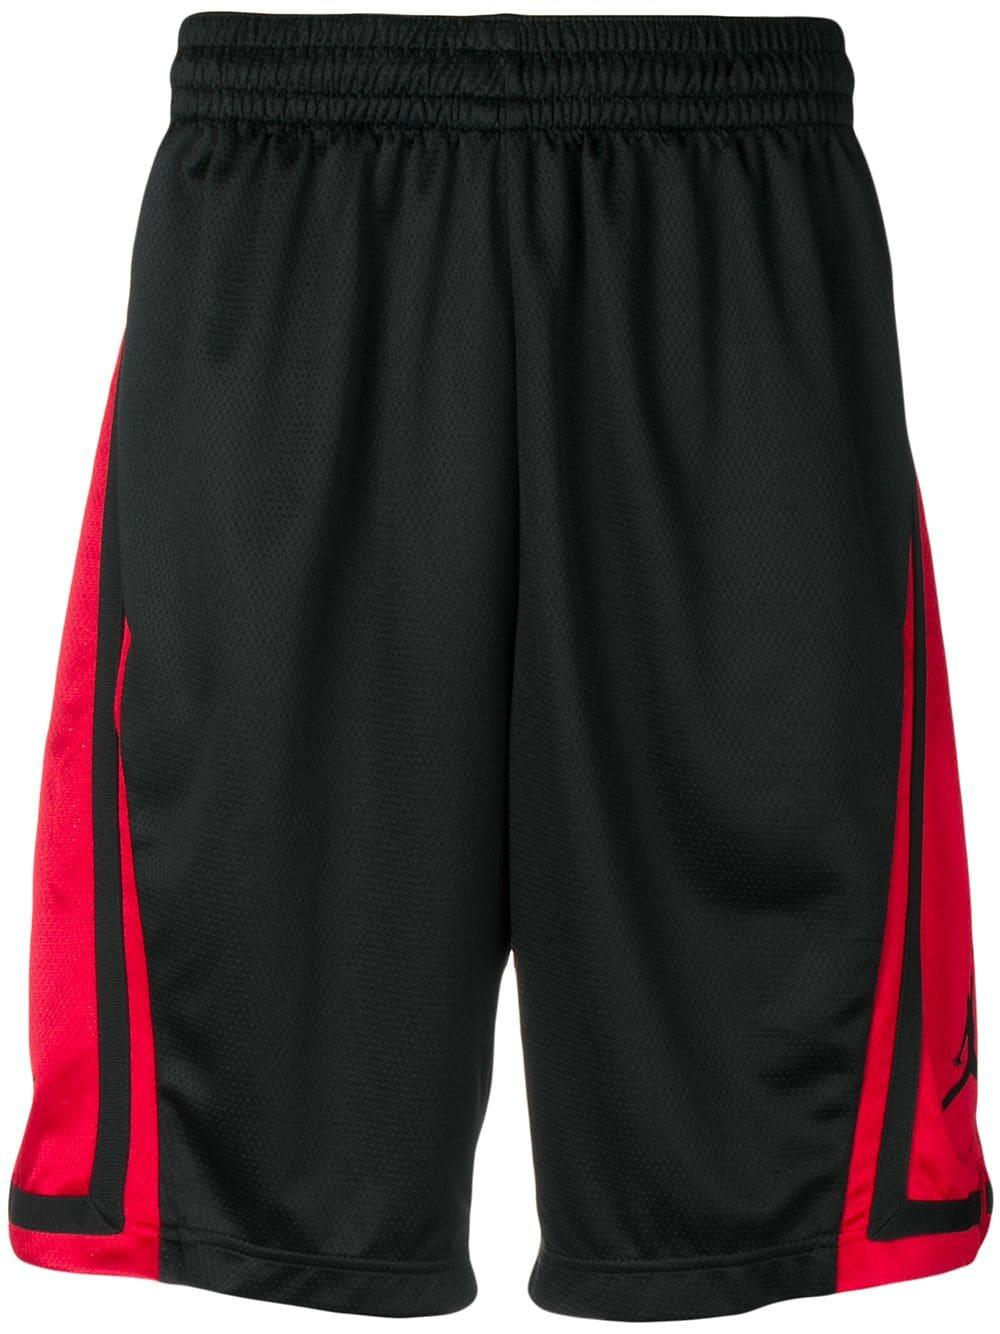 7ae397c21614 Nike - Black Jordan Dri-fit Shorts for Men - Lyst. View fullscreen